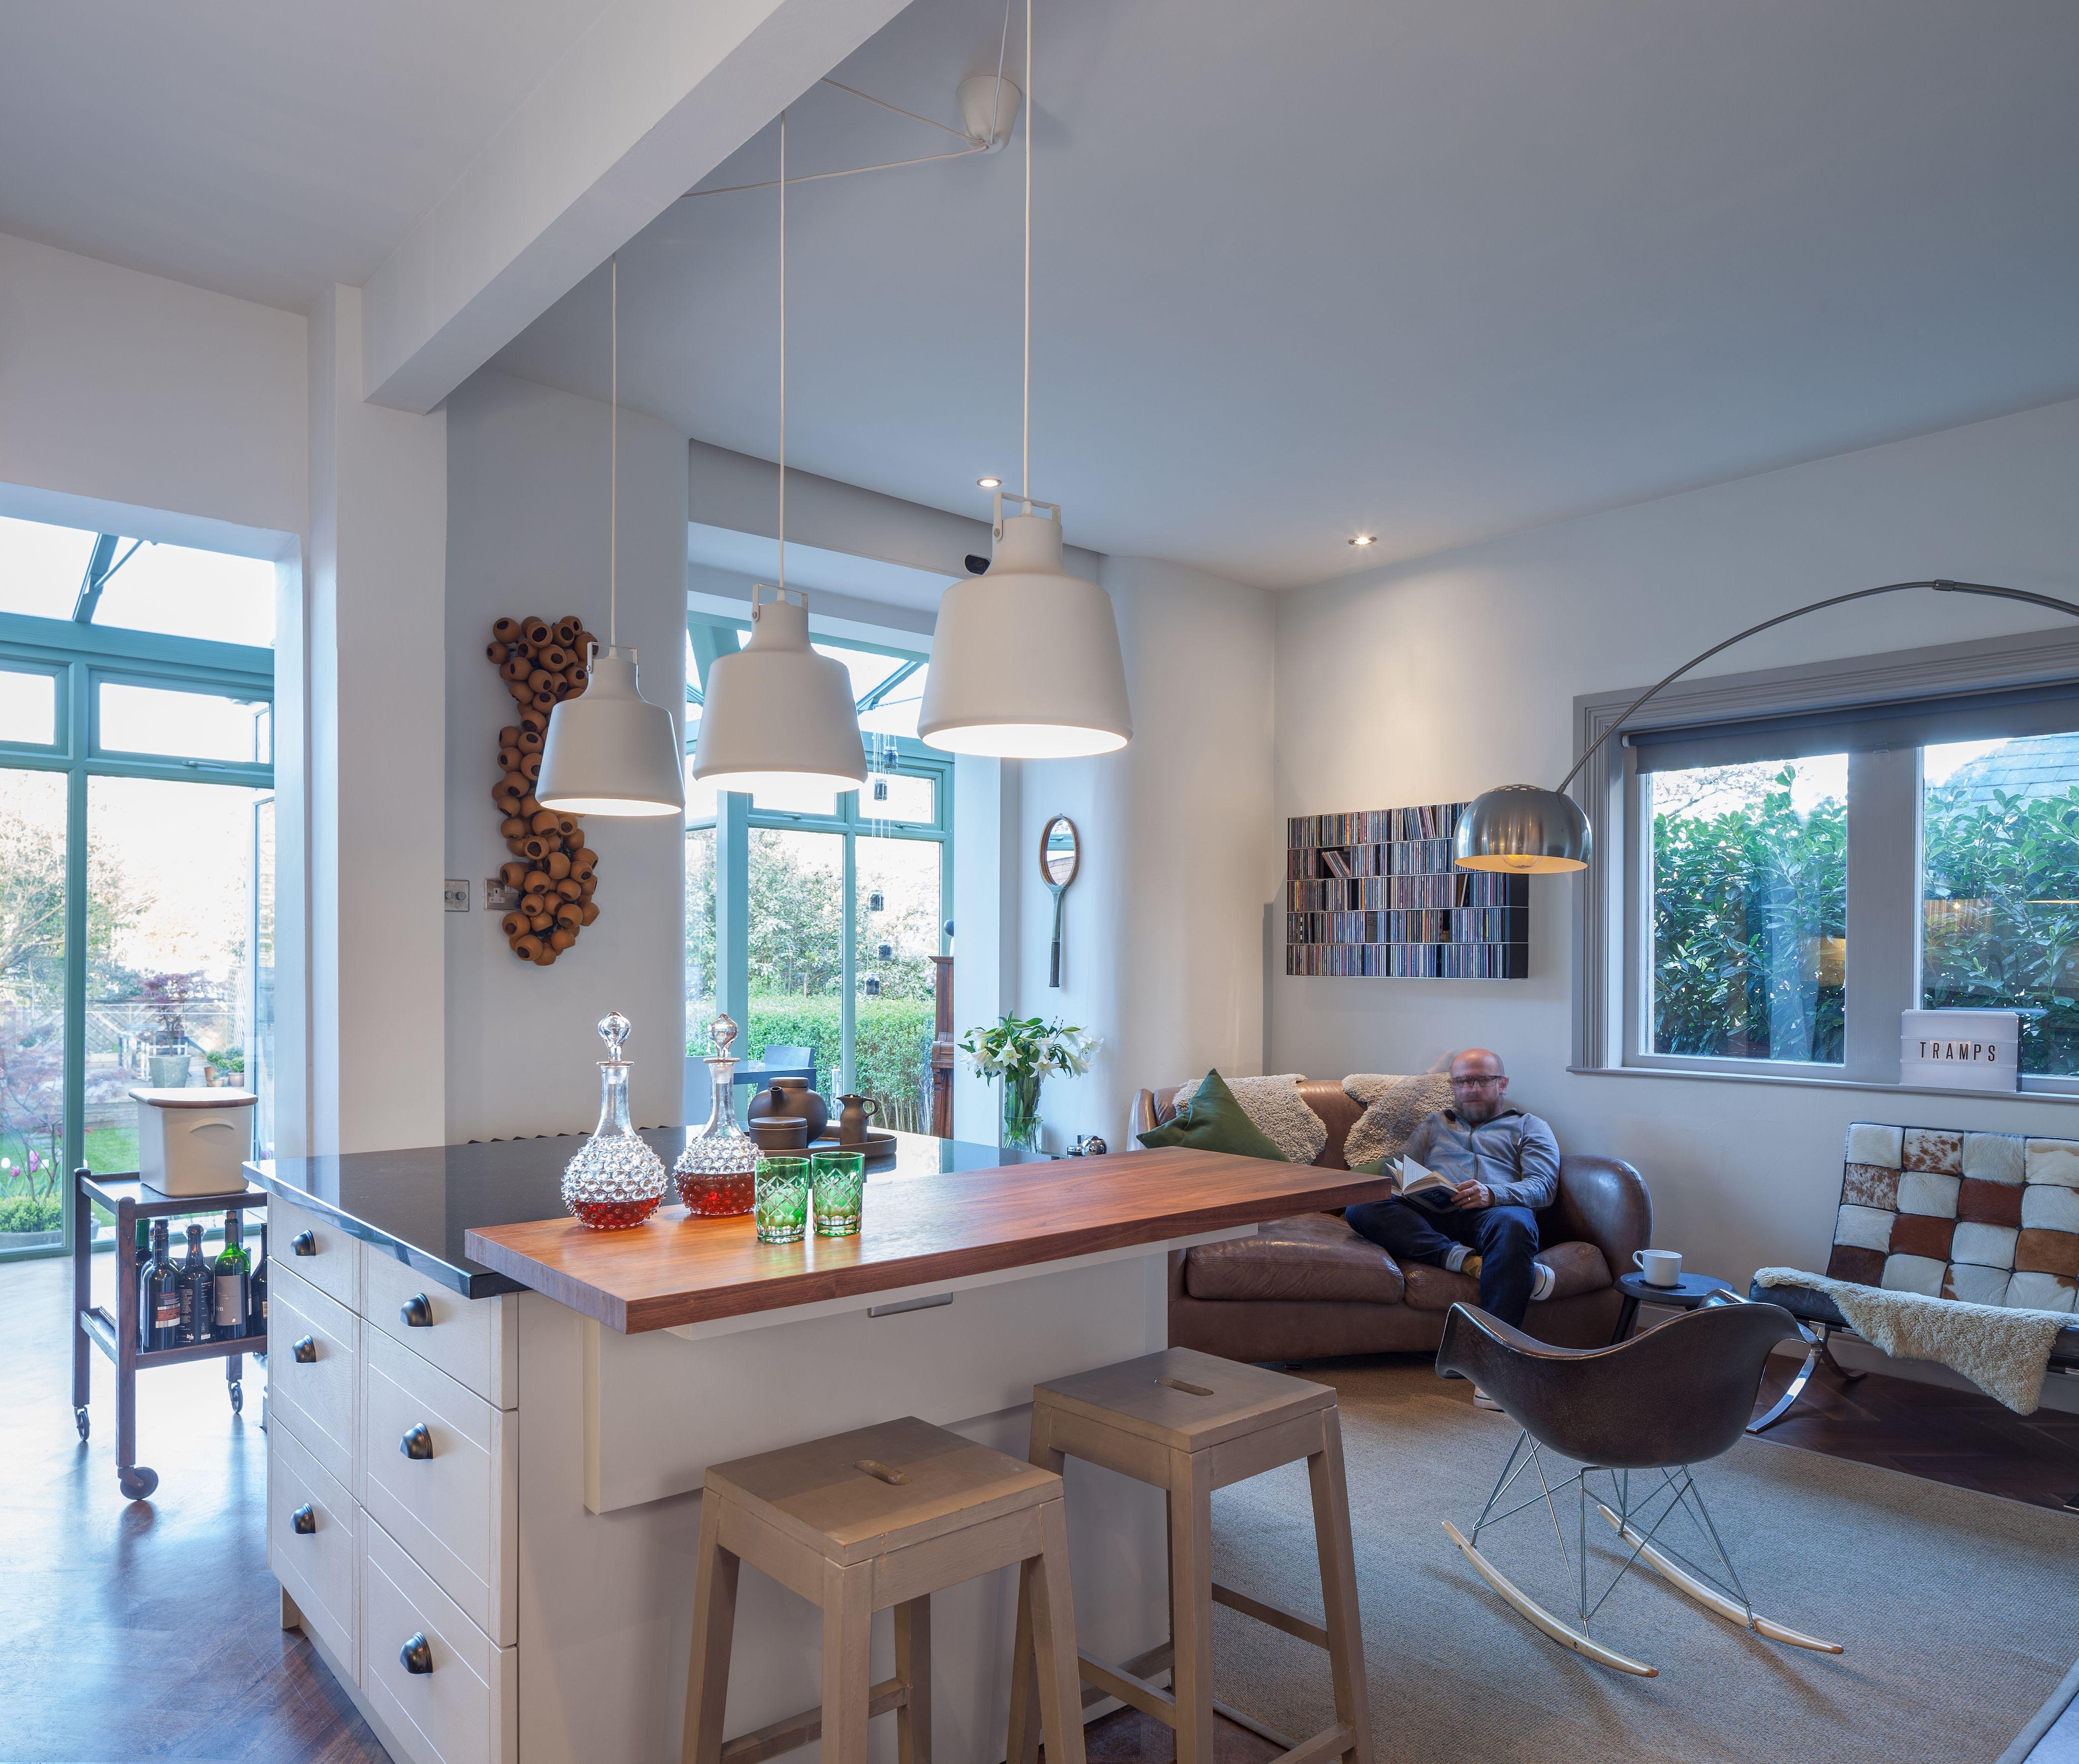 Period Kitchens Designs Renovation: Butterfield Architecture